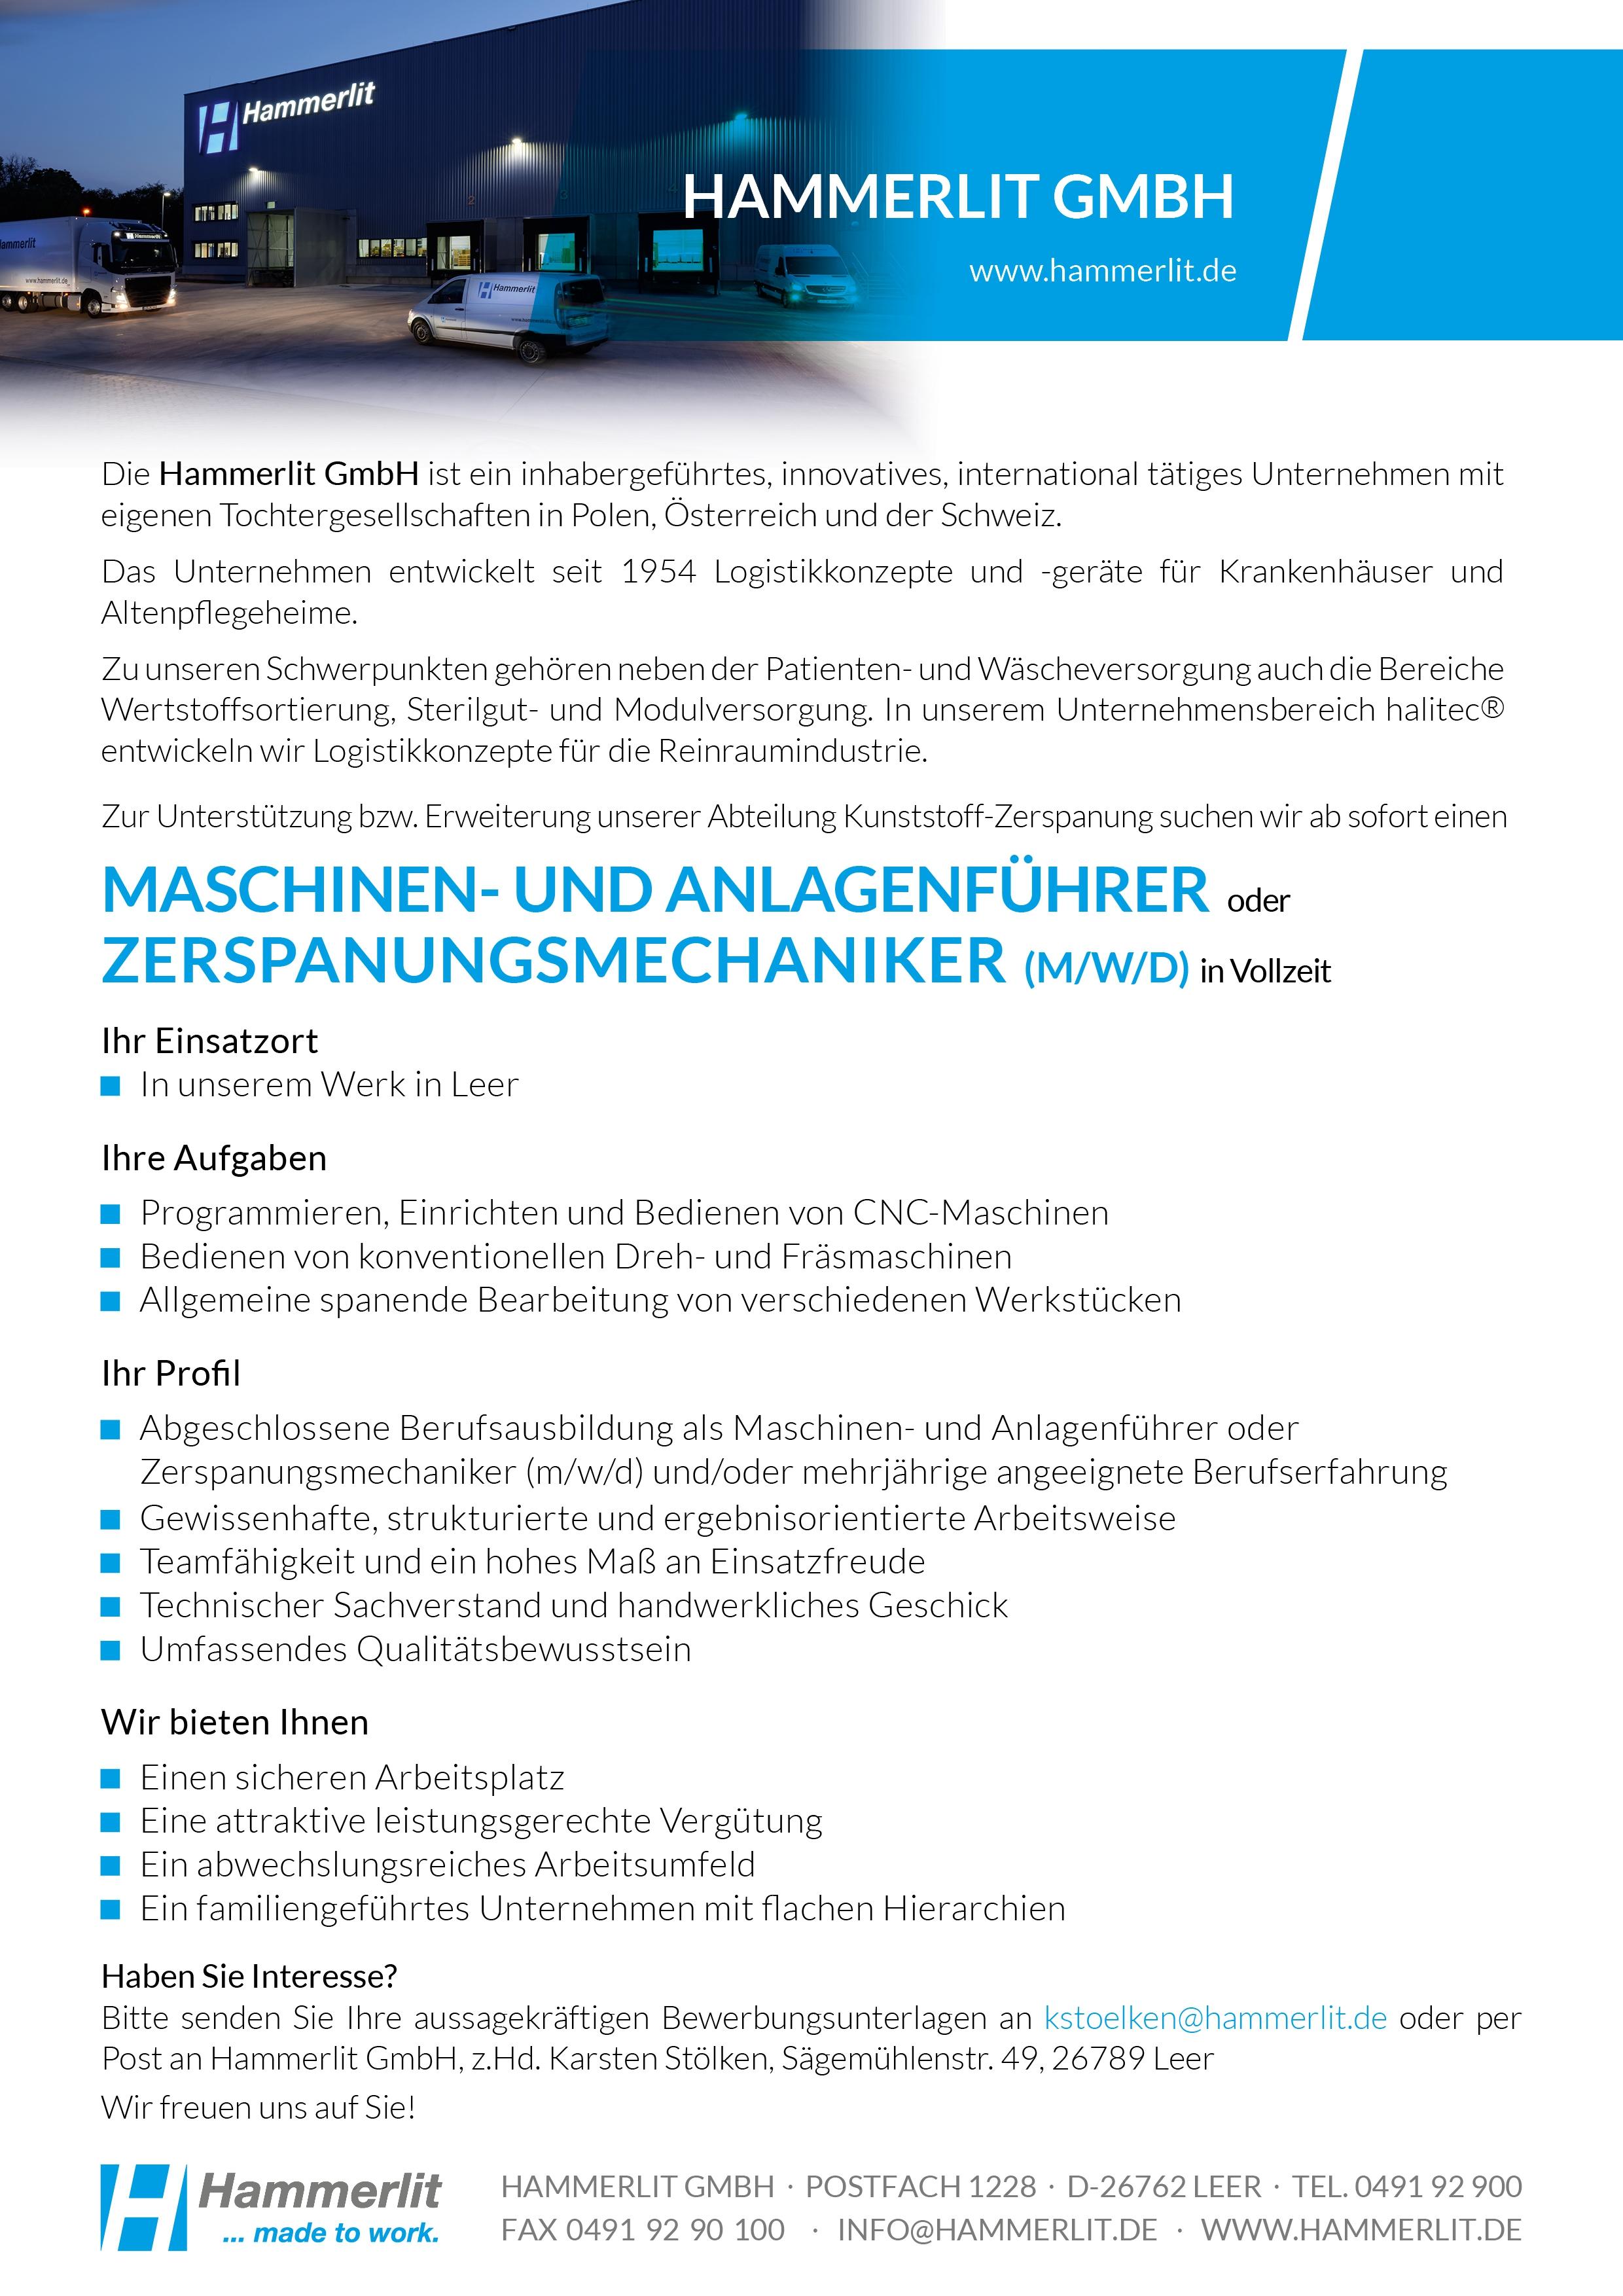 Zerspanungsmechaniker_Hammerlit GmbH